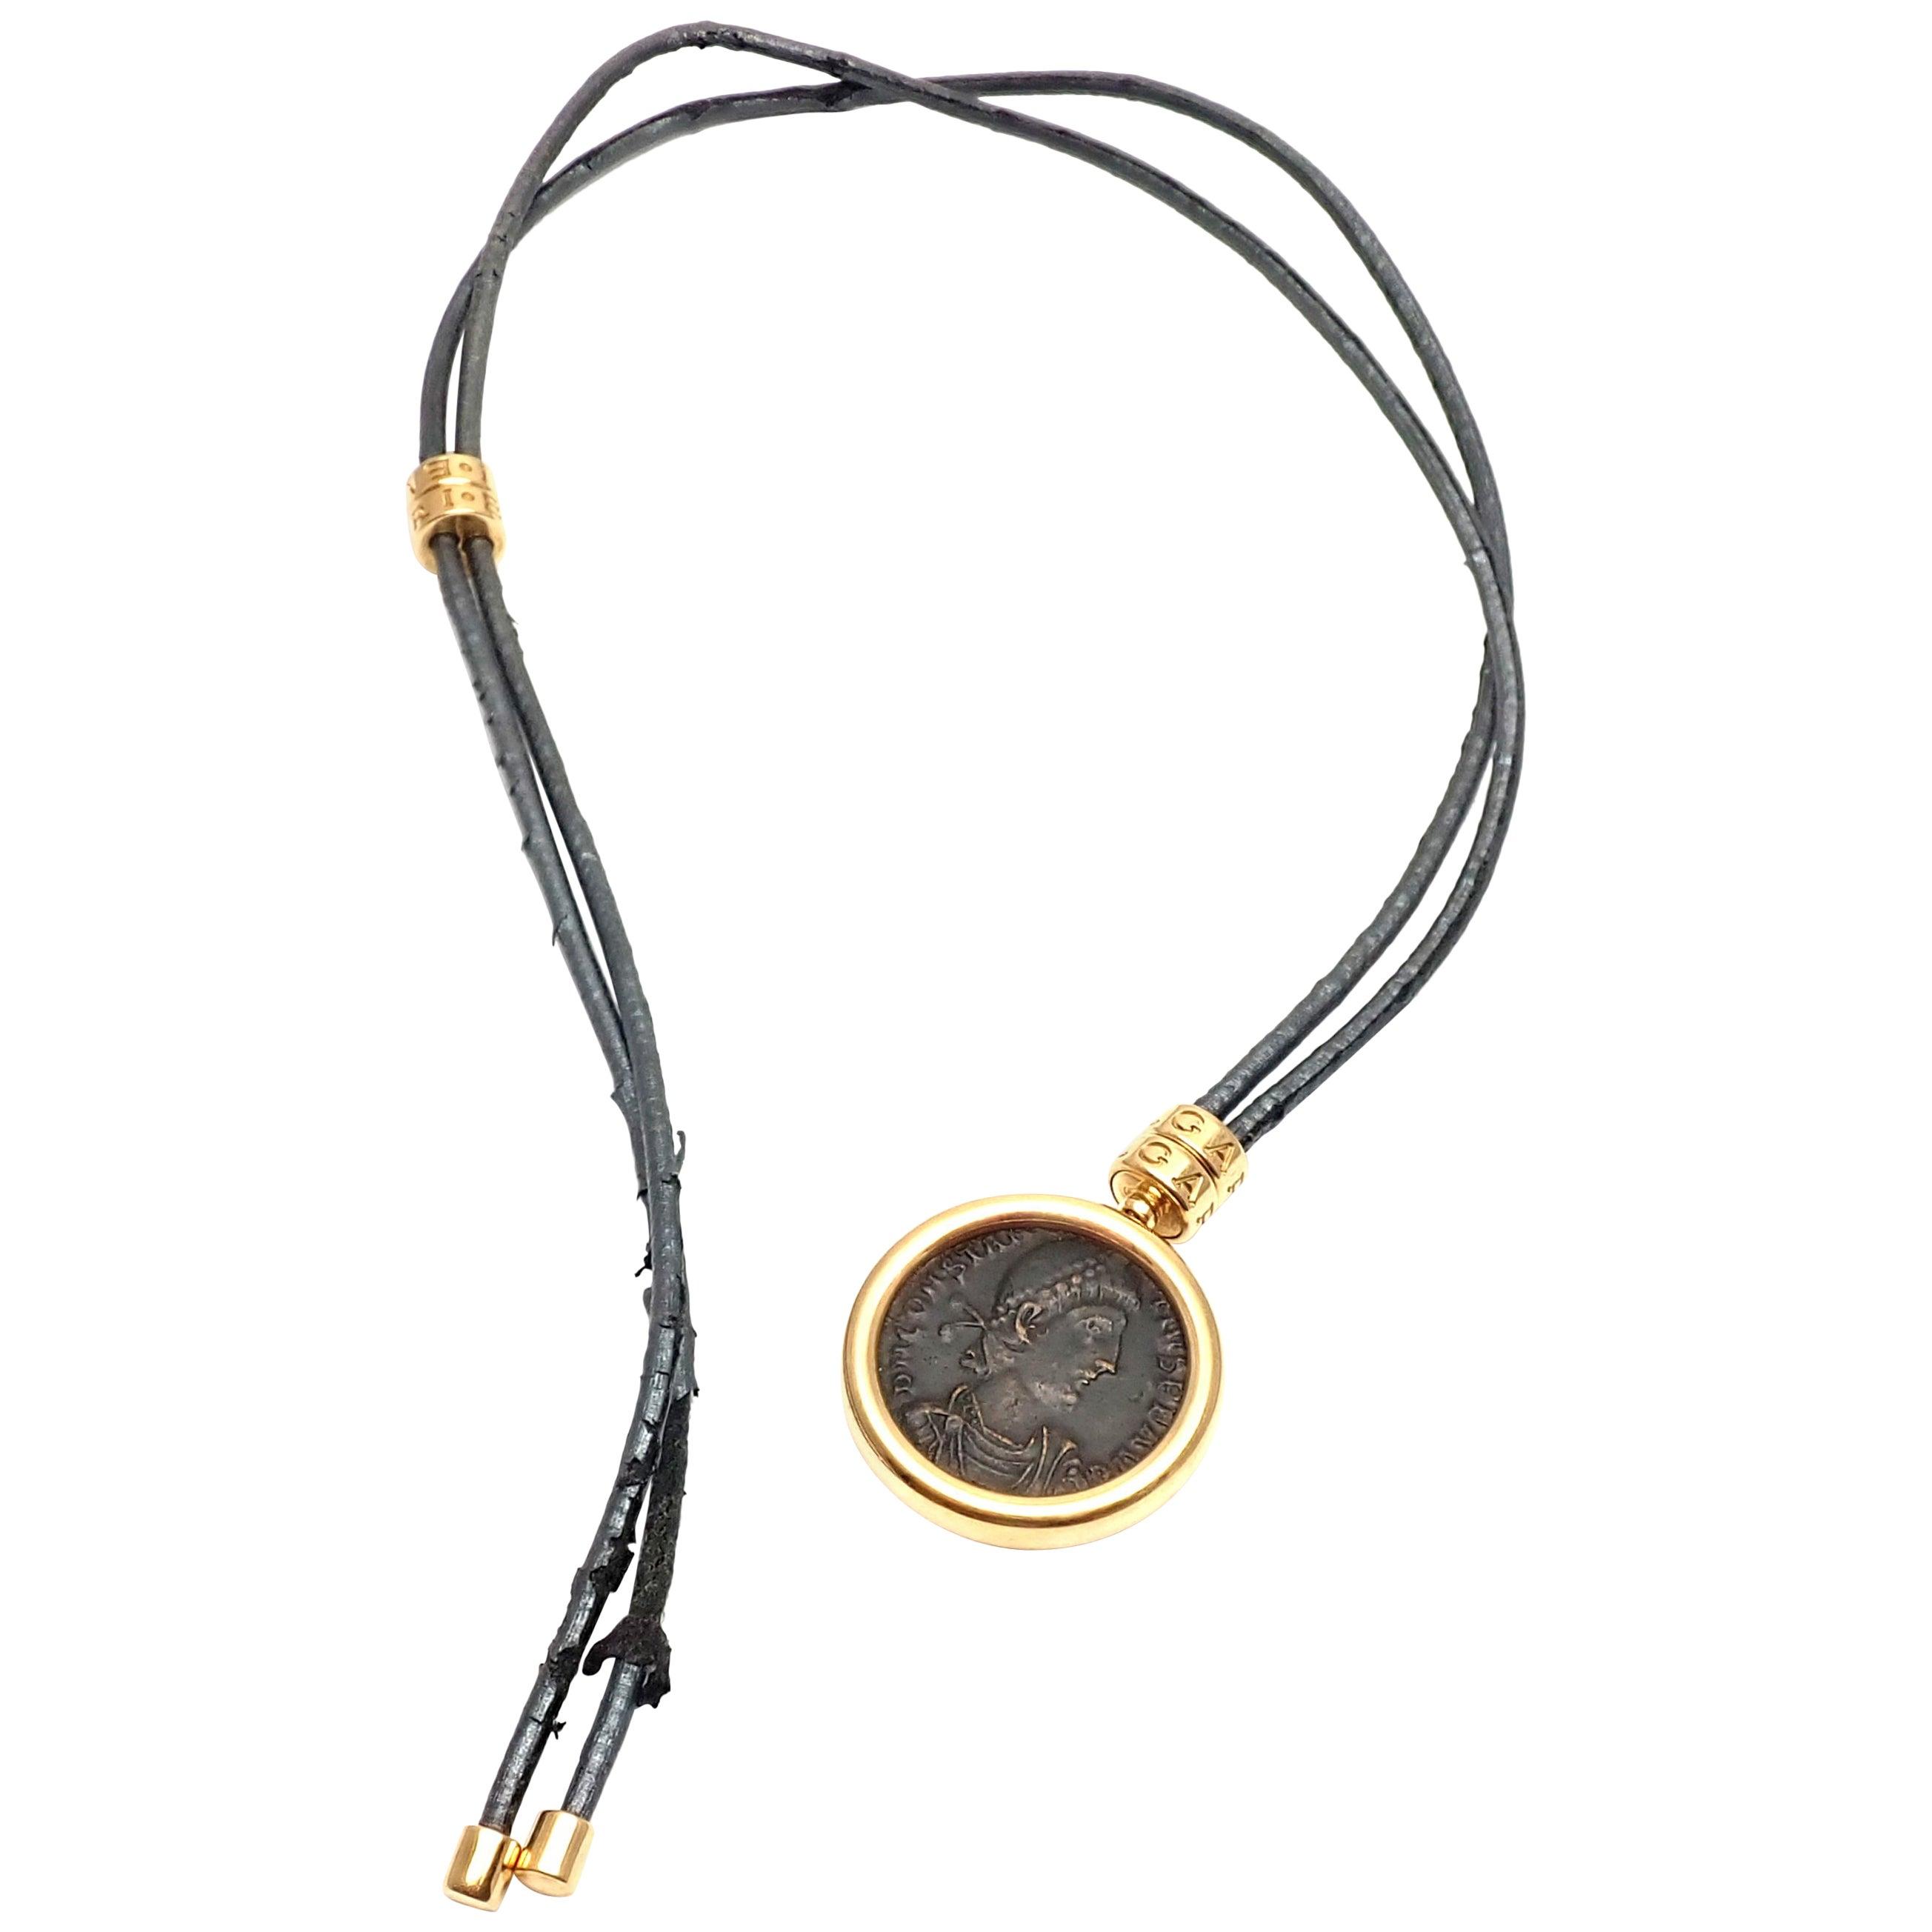 Bulgari Monete Coin Black Lace Yellow Gold Pendant Necklace